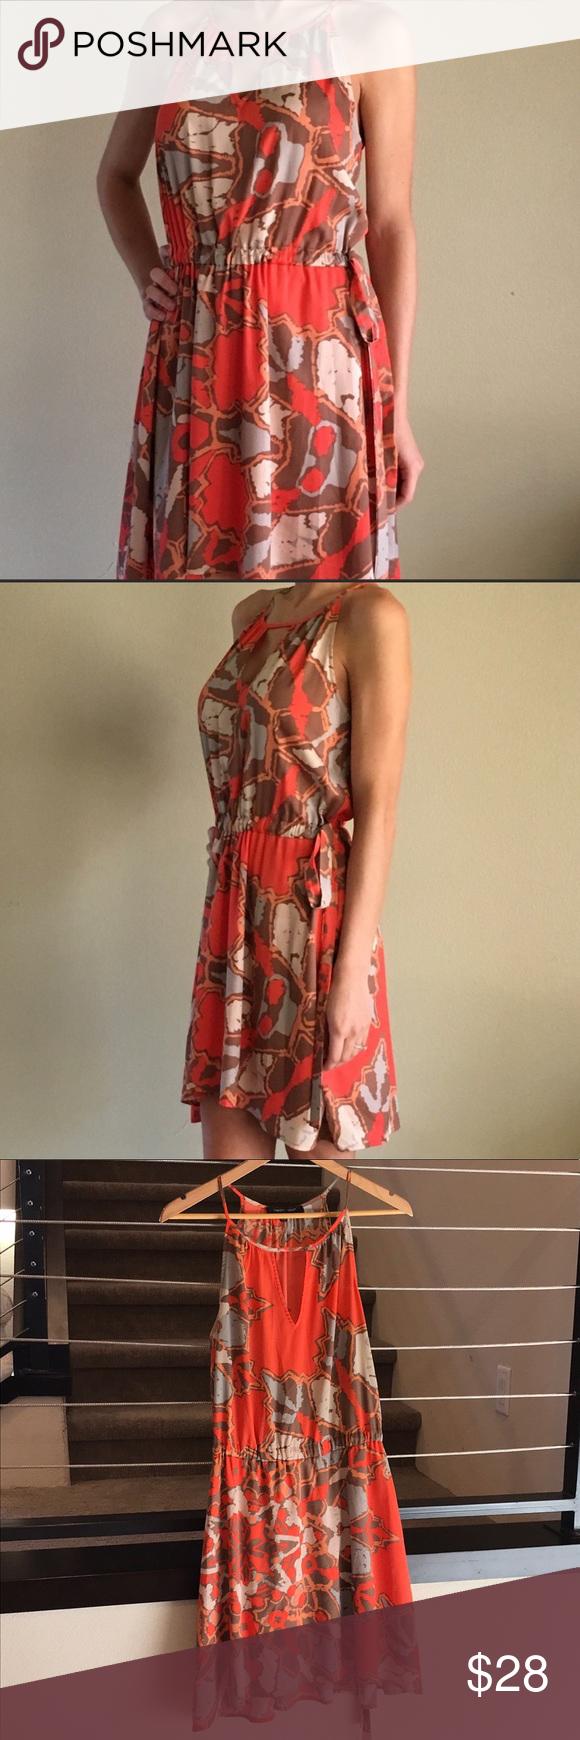 Key Hole Tie Wait Front Summer Print Dress Printed Summer Dresses Dresses Print Dress [ 1740 x 580 Pixel ]